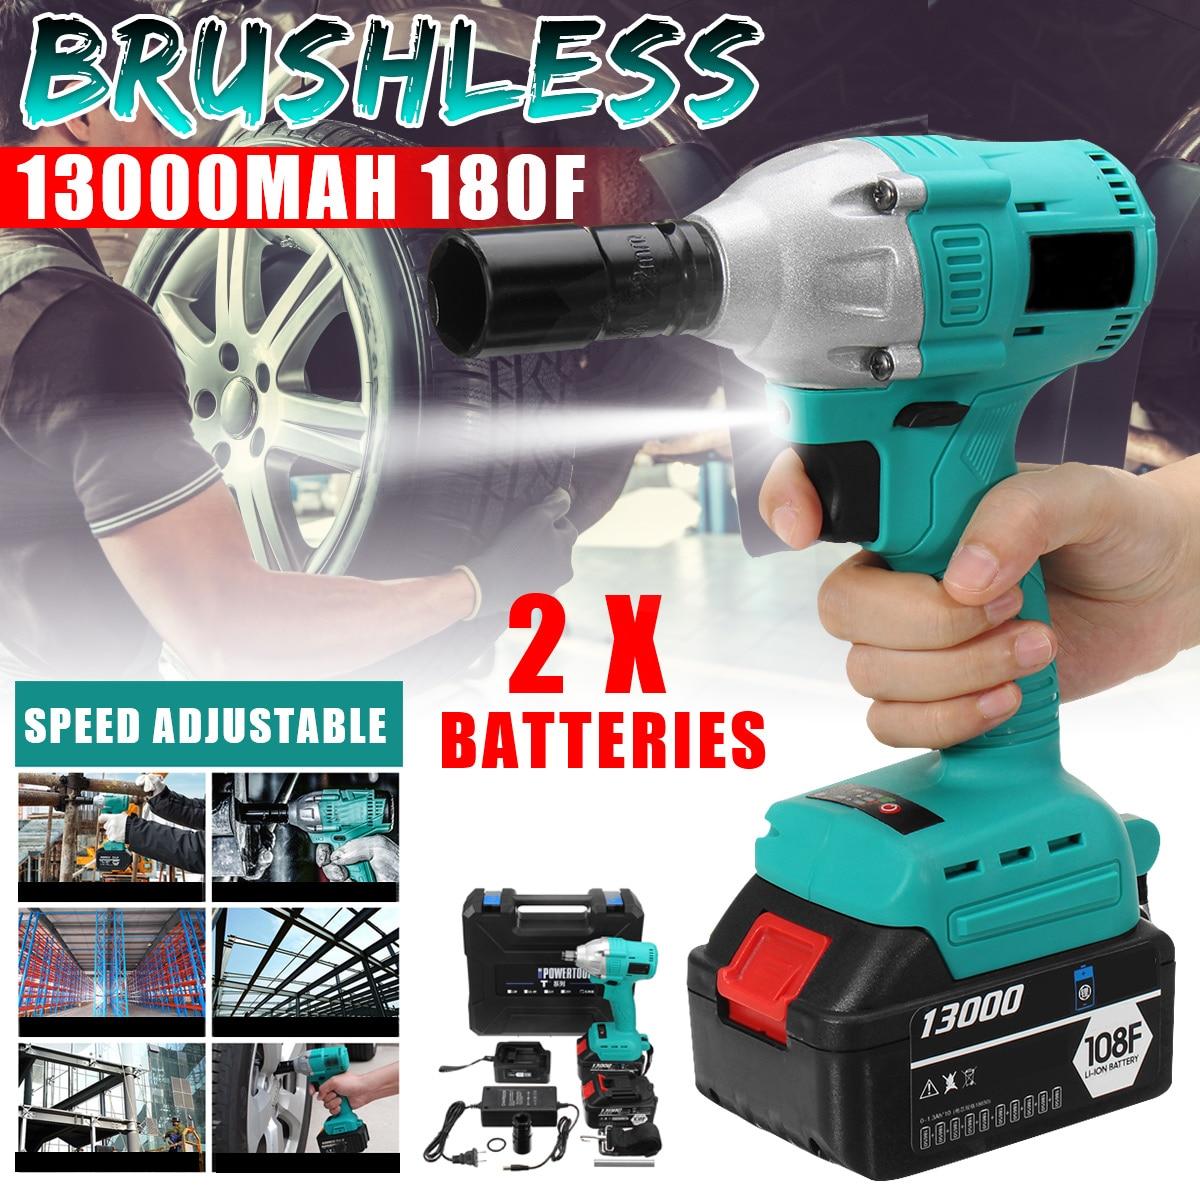 Brushless Elettrico Shock Cordless Impact Wrench 340 NM Cordless FAI DA TE Per Uso Domestico Elettrico Chiave w/2 pz 108F 13000 mah batterie